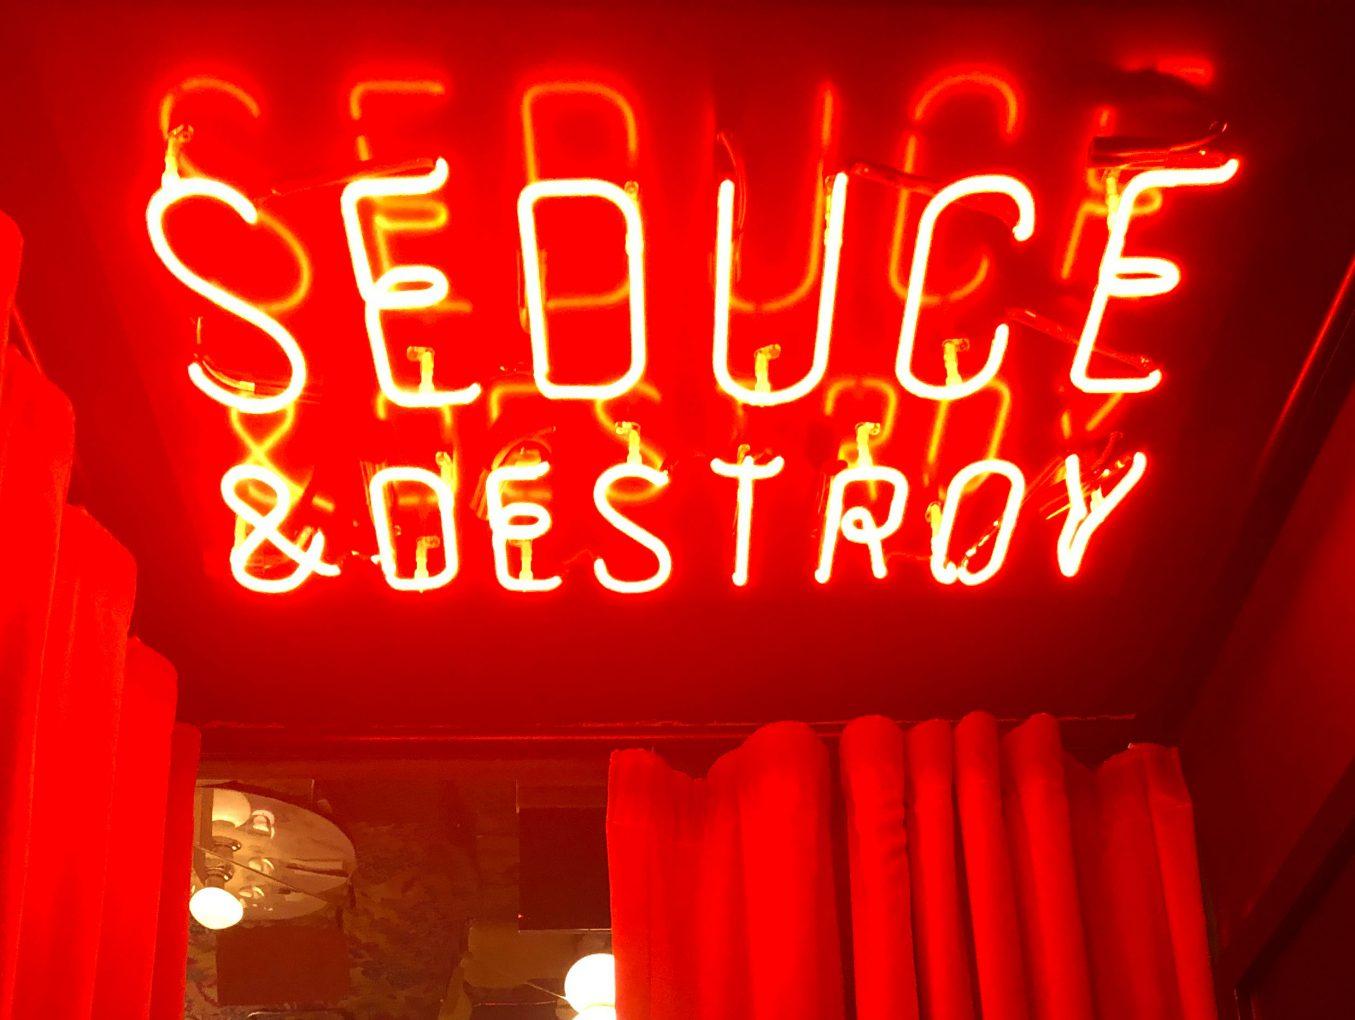 Seduce and destroy